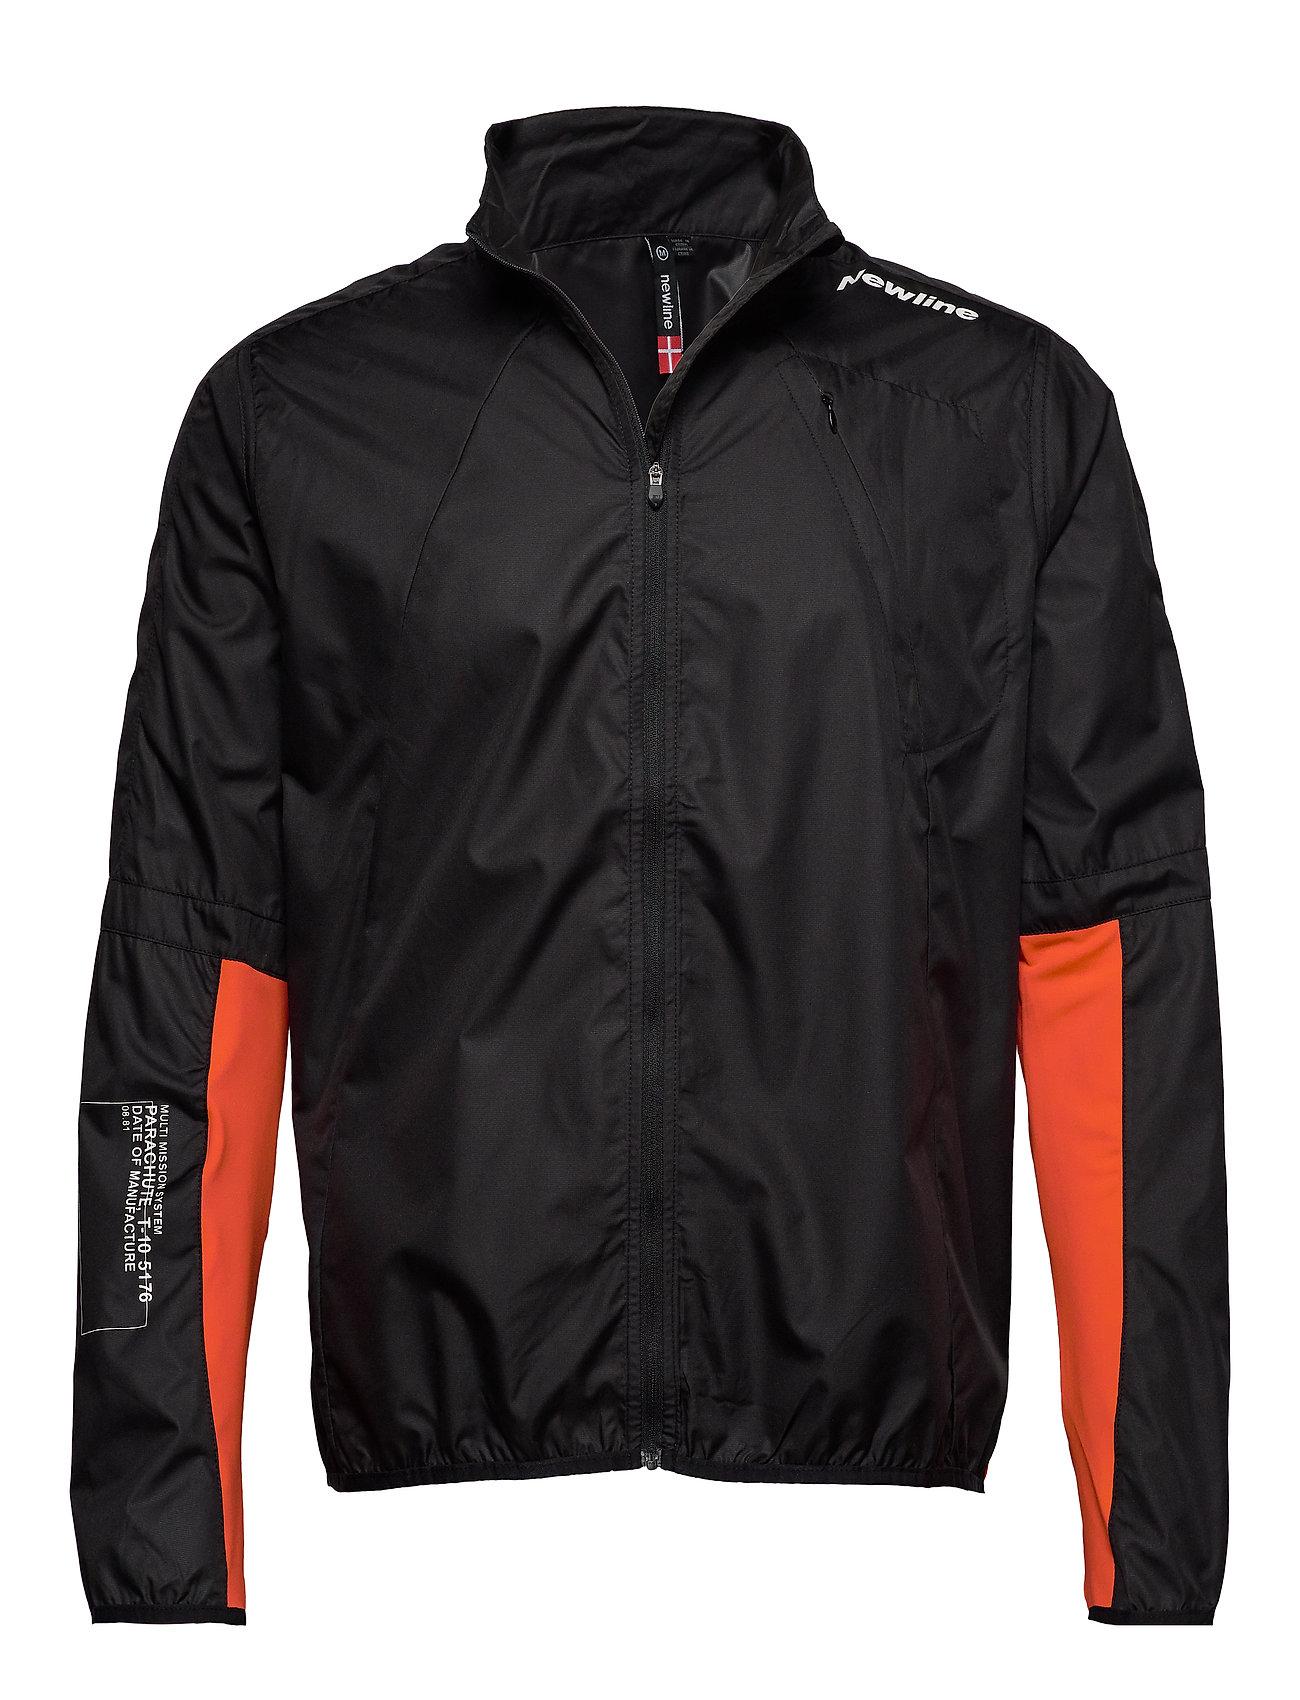 Newline Wind Jacket - BLACK/REAL ORANGE